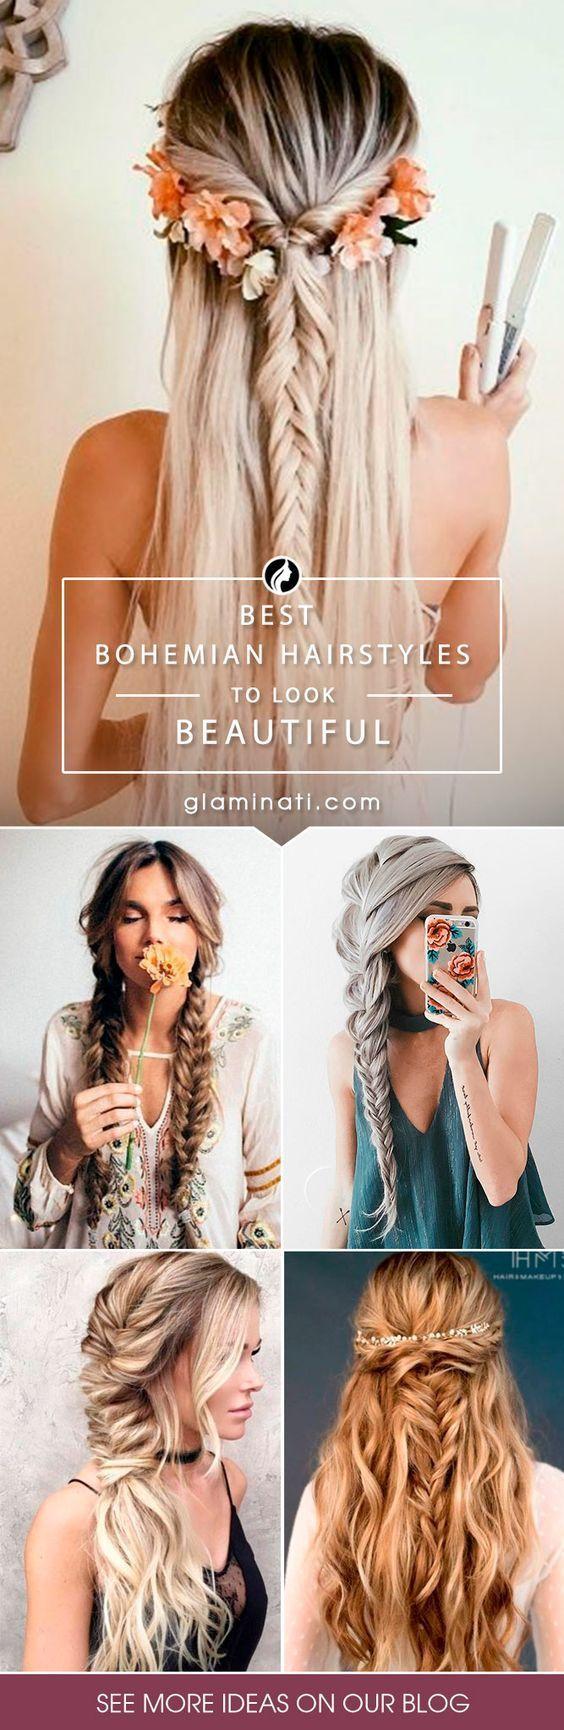 60+ Best Bohemian Hairstyles That Turn Heads Gallery